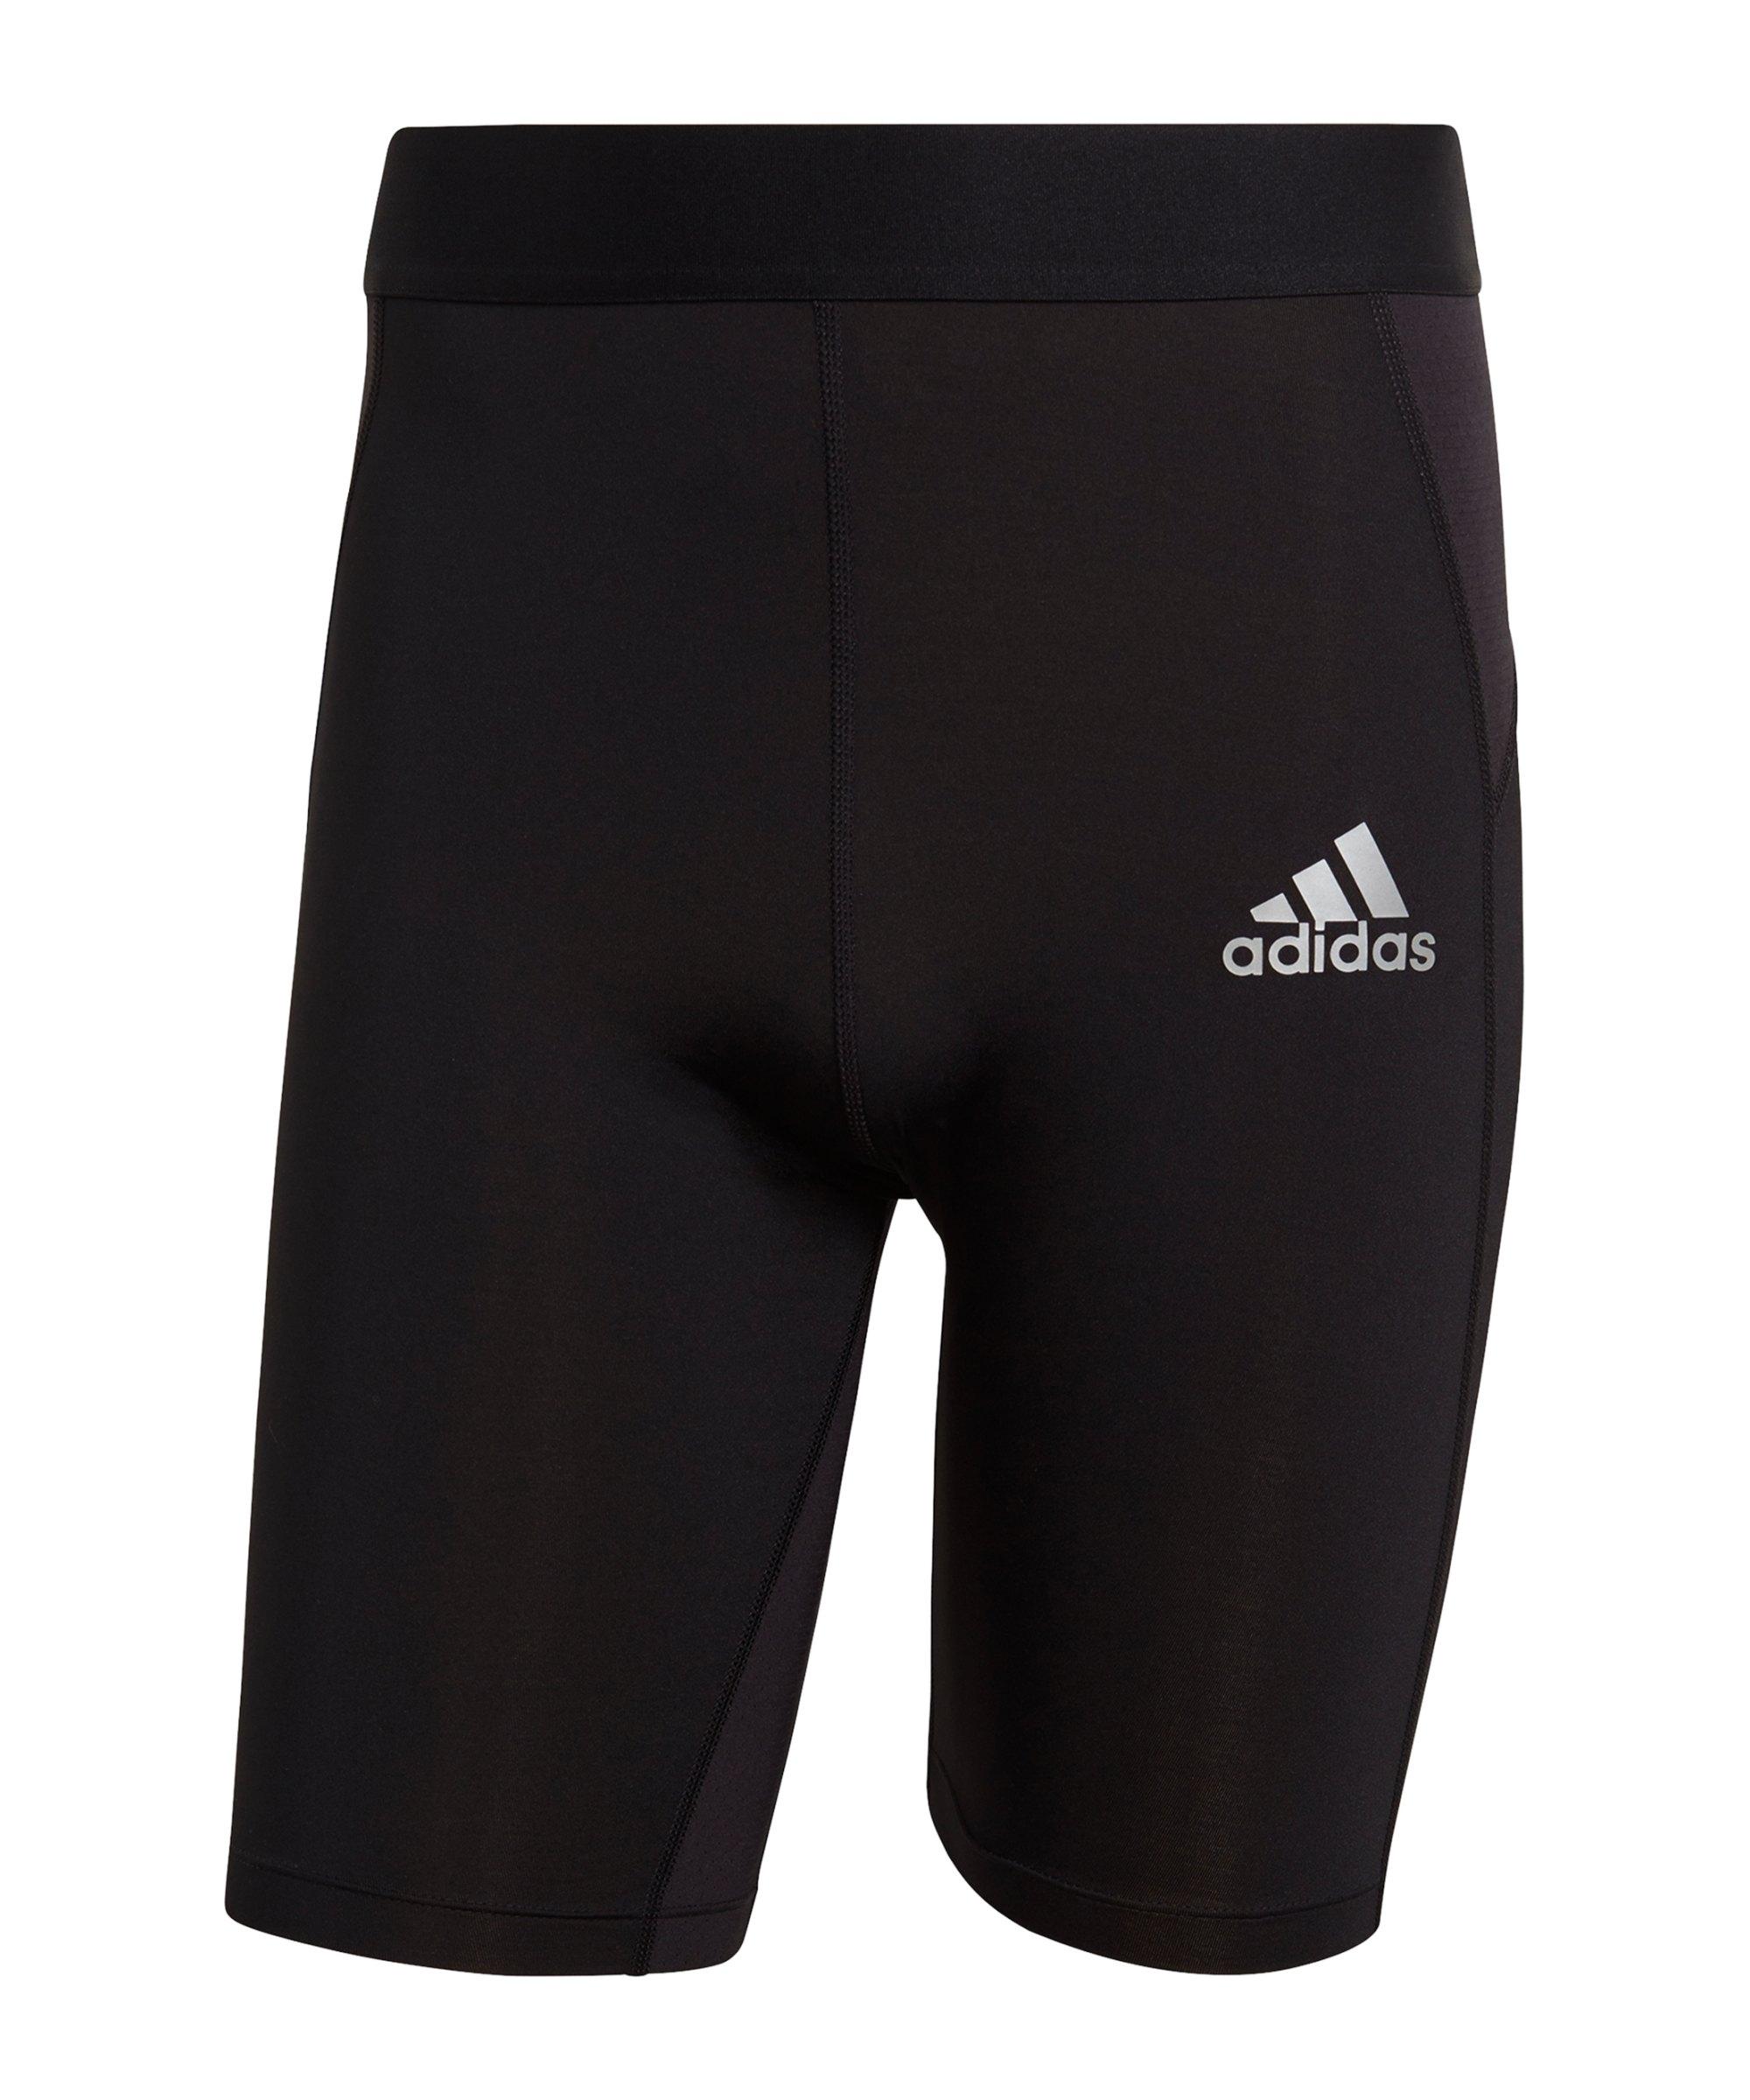 adidas Techfit Short Schwarz - schwarz